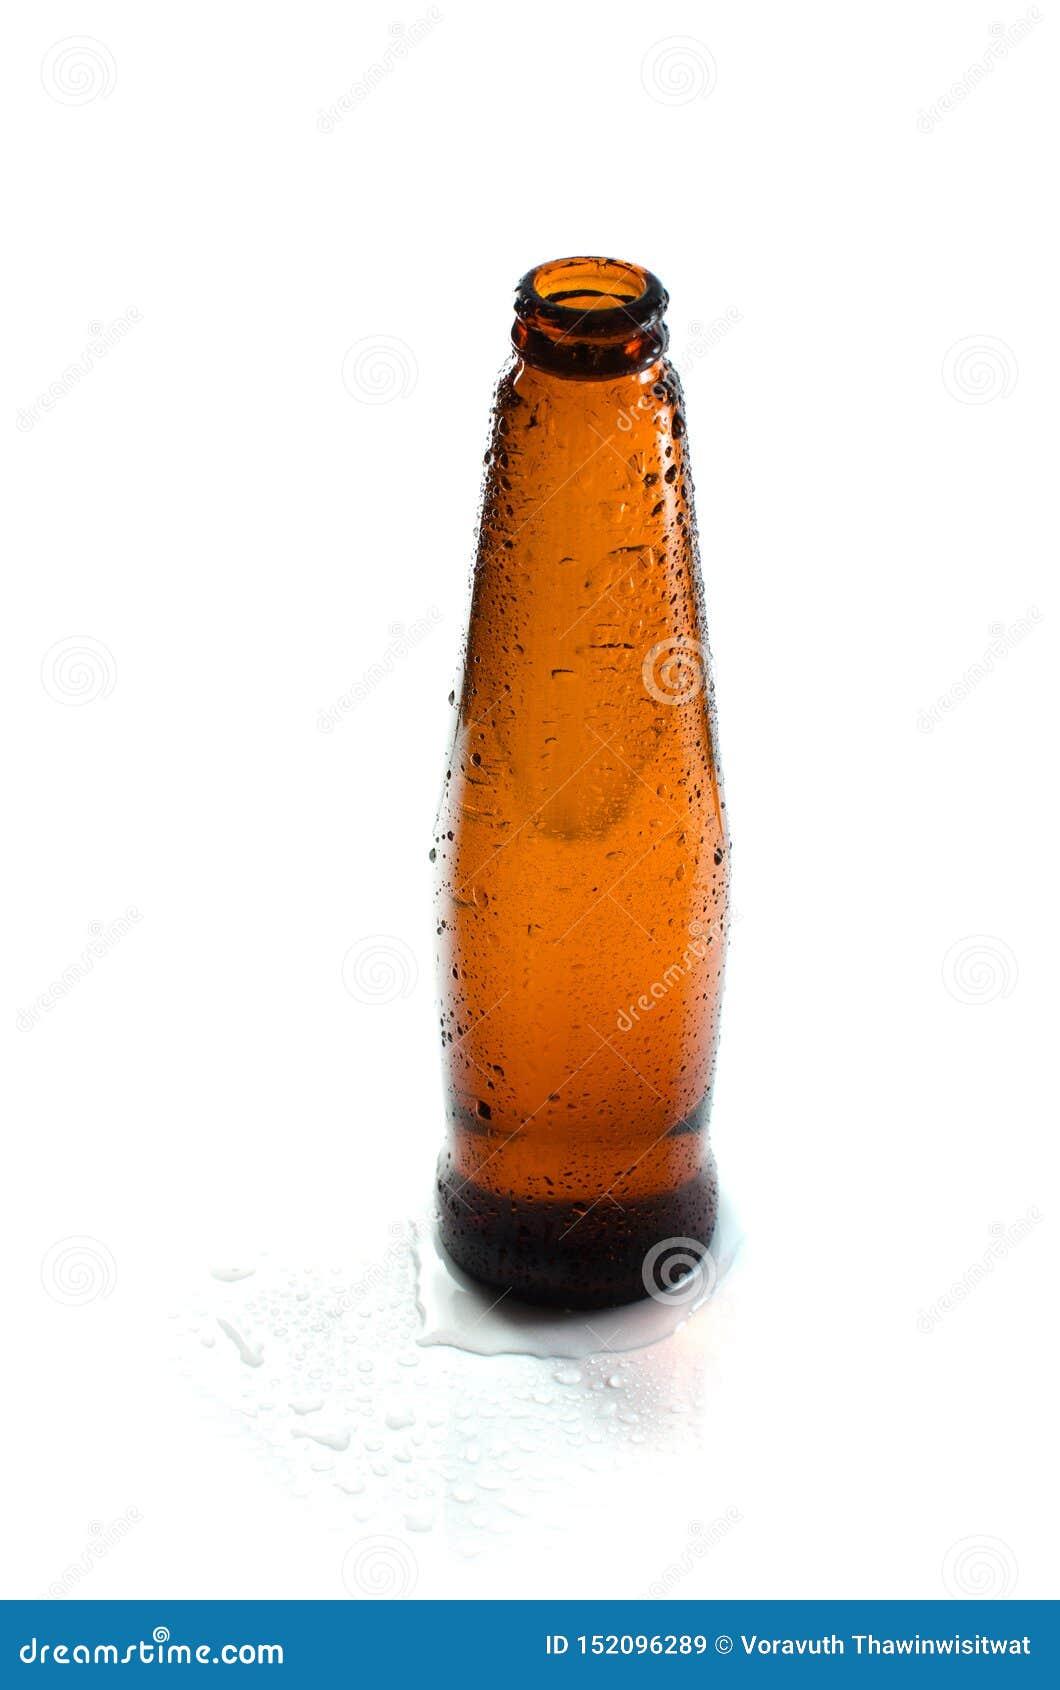 Wet bottle on white background